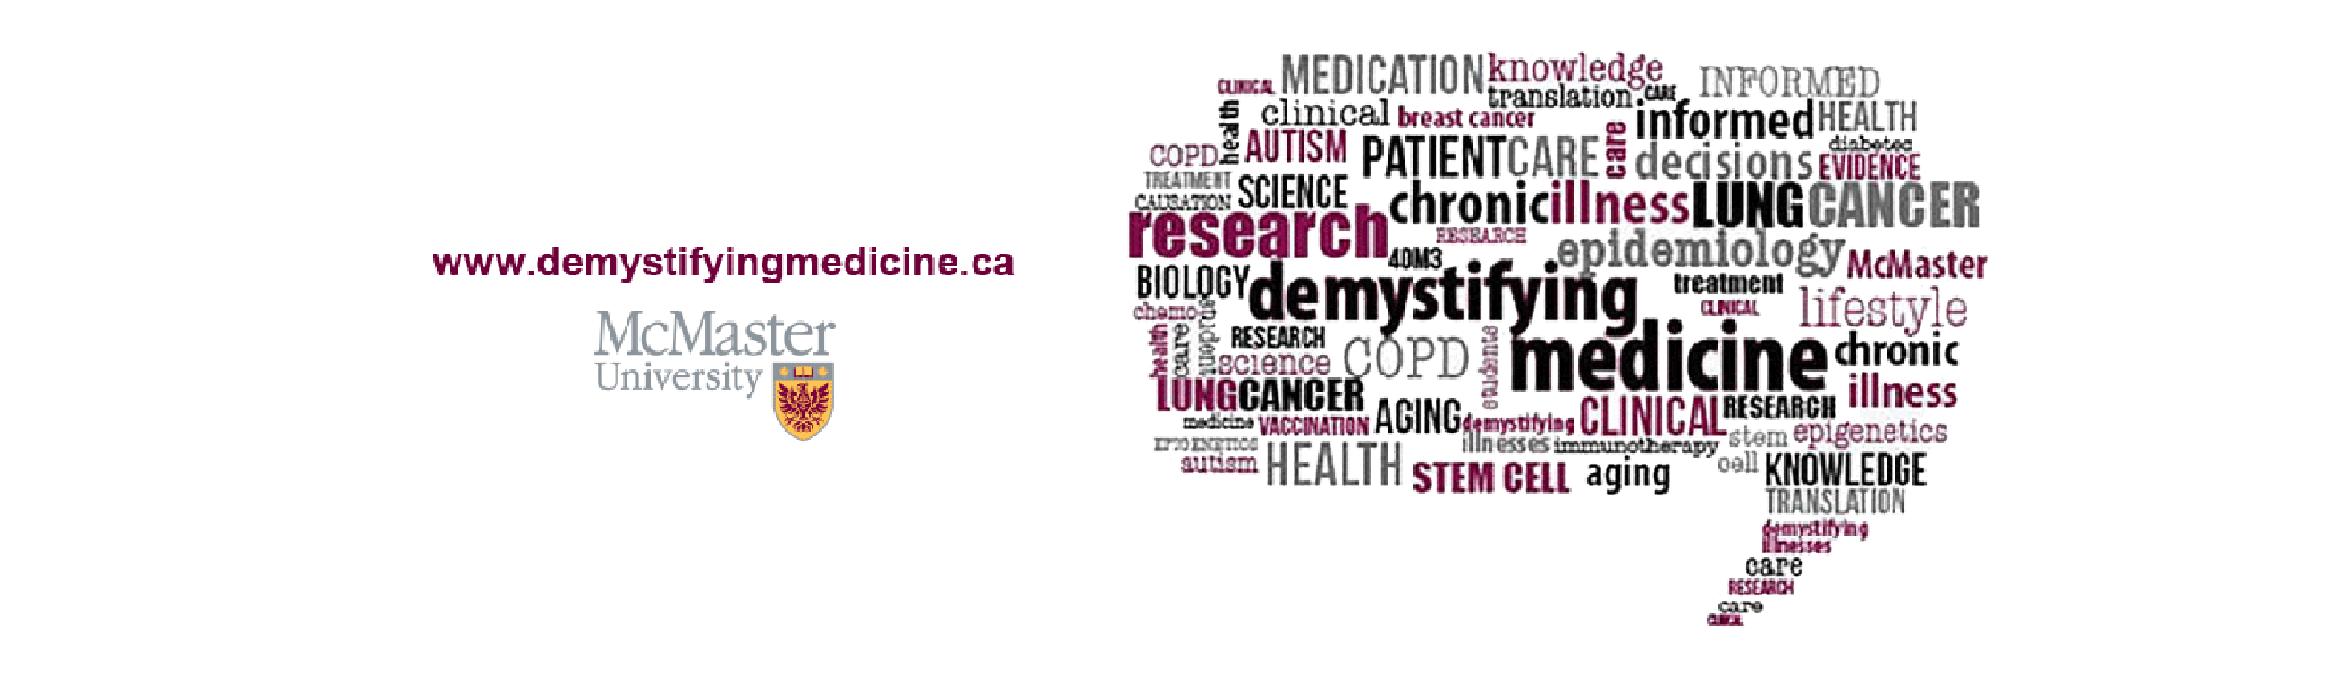 Demystifying Medicine Home